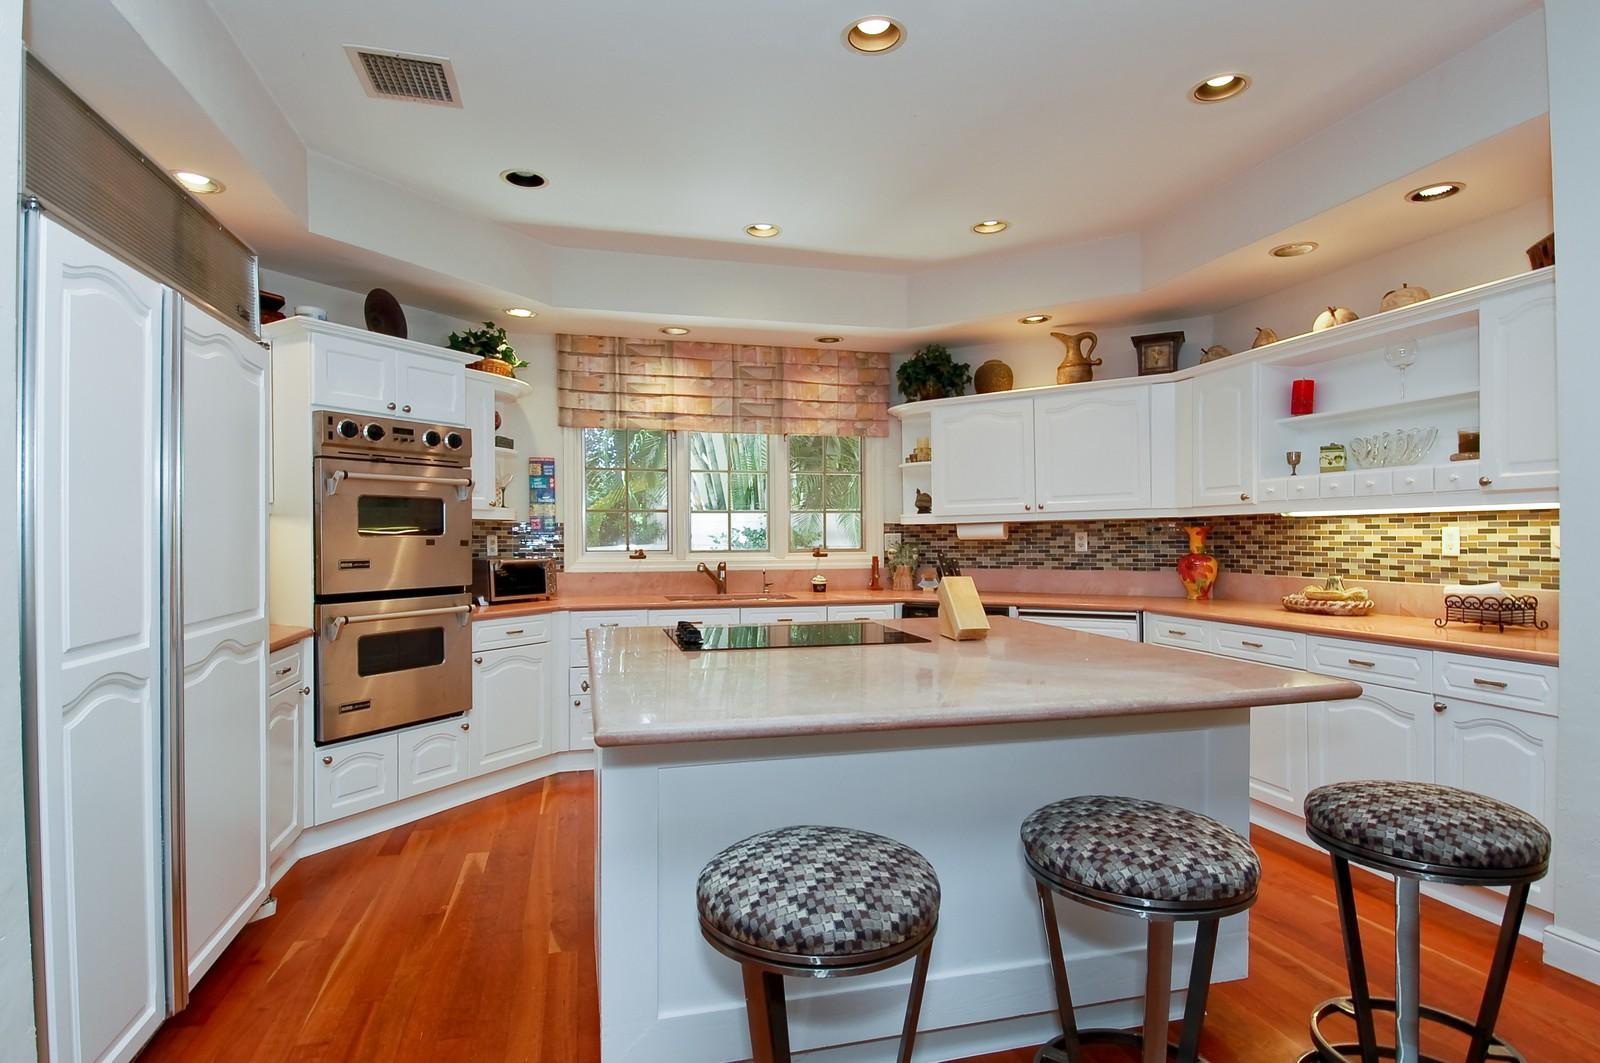 Real Estate Photography - 4798 Sanctuary Ln, Boca Raton, FL, 33431 - Kitchen